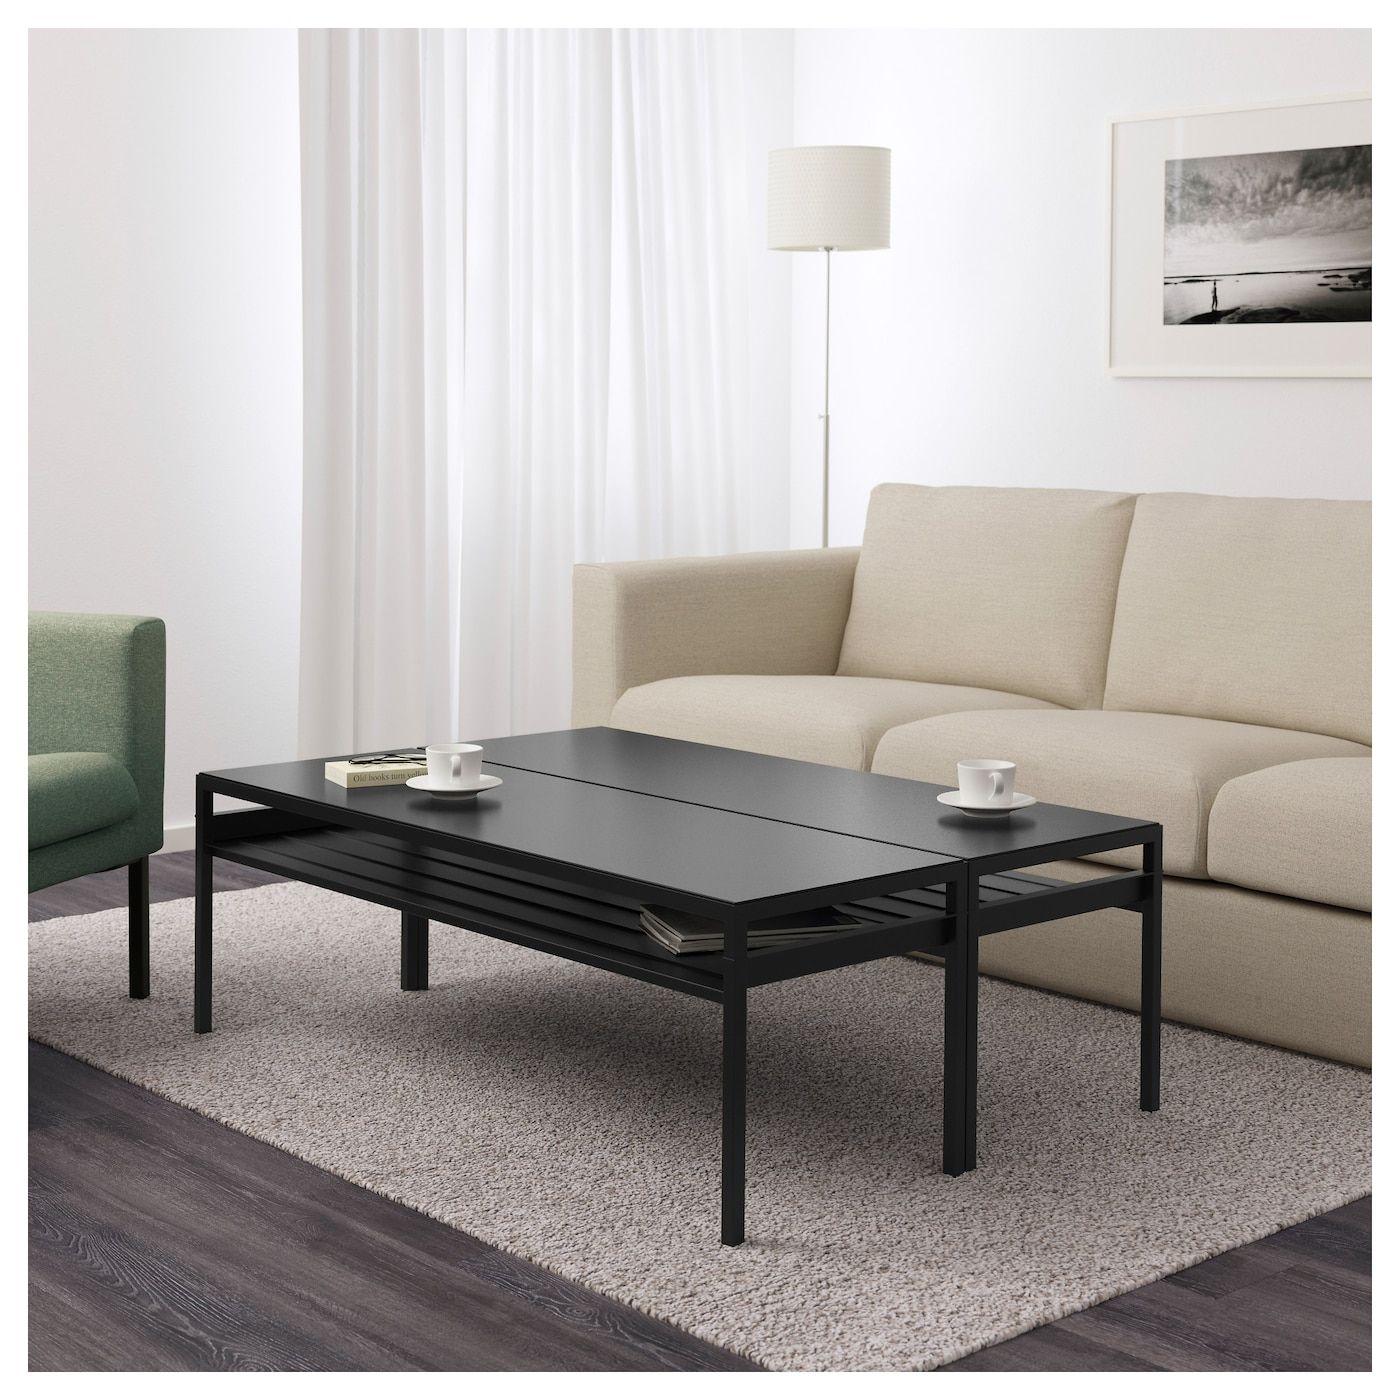 Home Furniture Decor Outdoors Shop Online Coffee Table Ikea Lack Side Table Ikea Side Table [ 1400 x 1400 Pixel ]